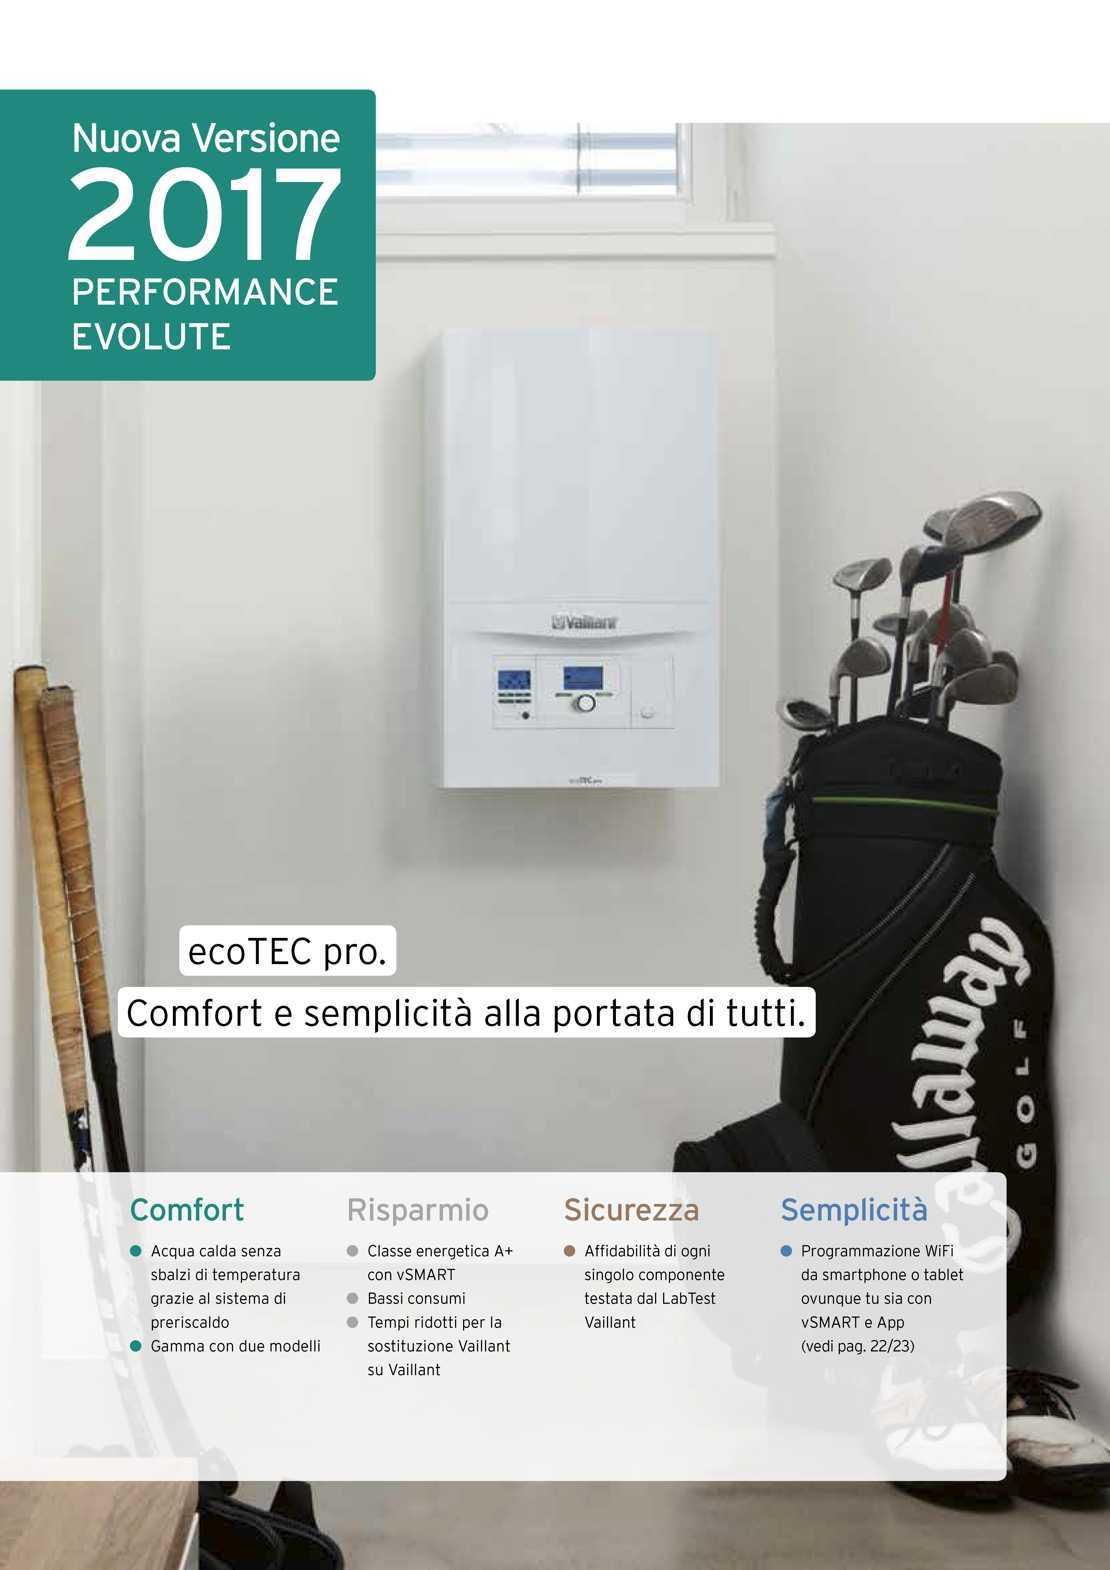 Vaillant Caldaia ecoTEC pro VMW236 vSmart WiFi